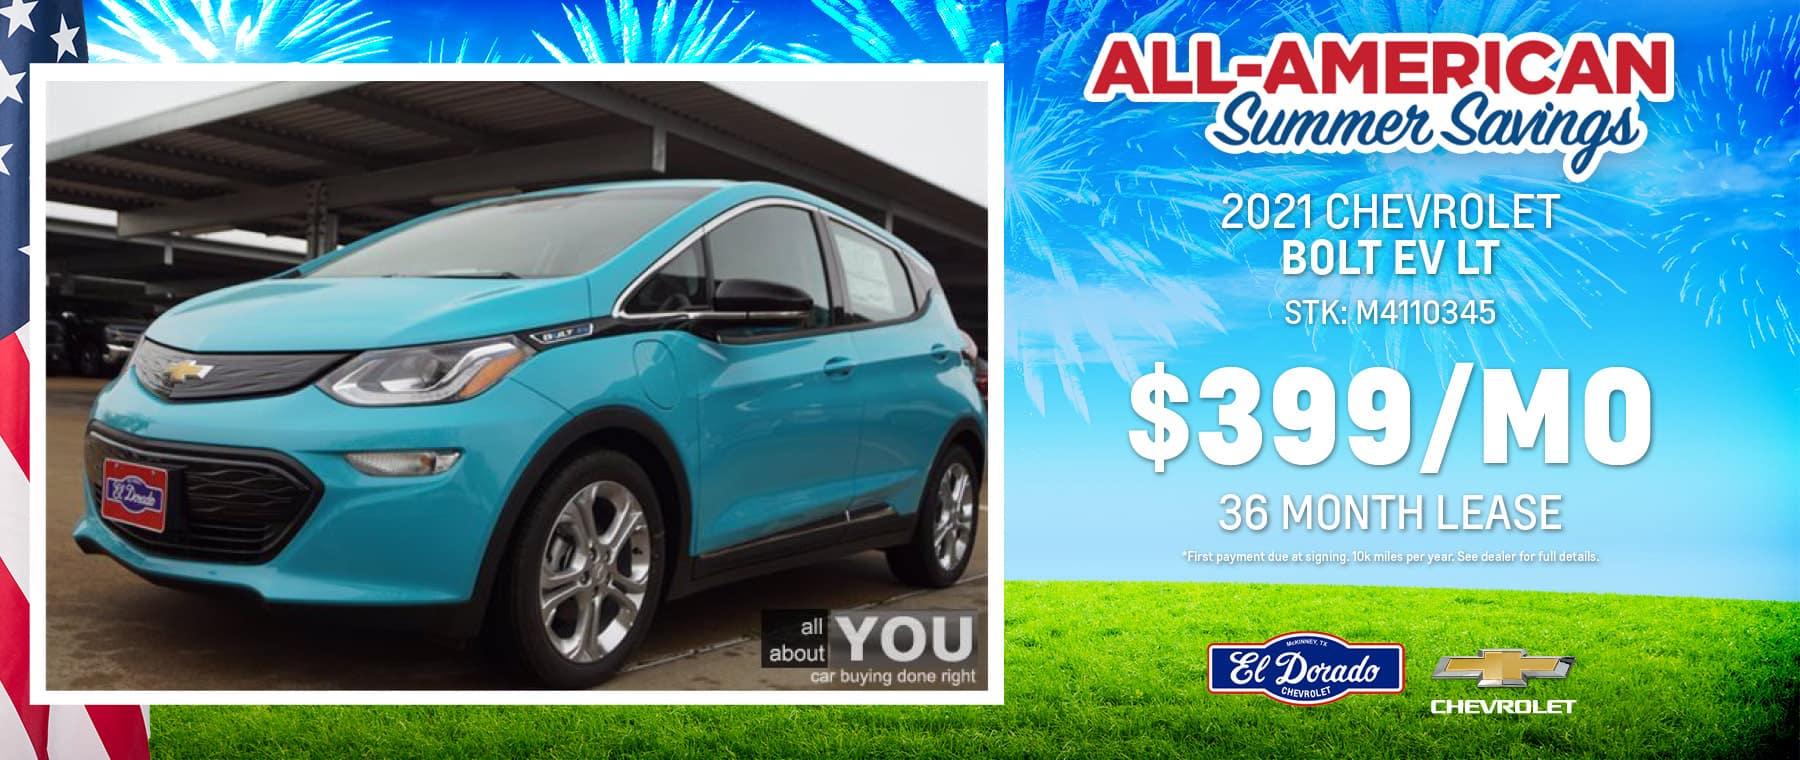 2021 Chevrolet Bolt EV LT - El Dorado Chevrolet in McKinney, Texas